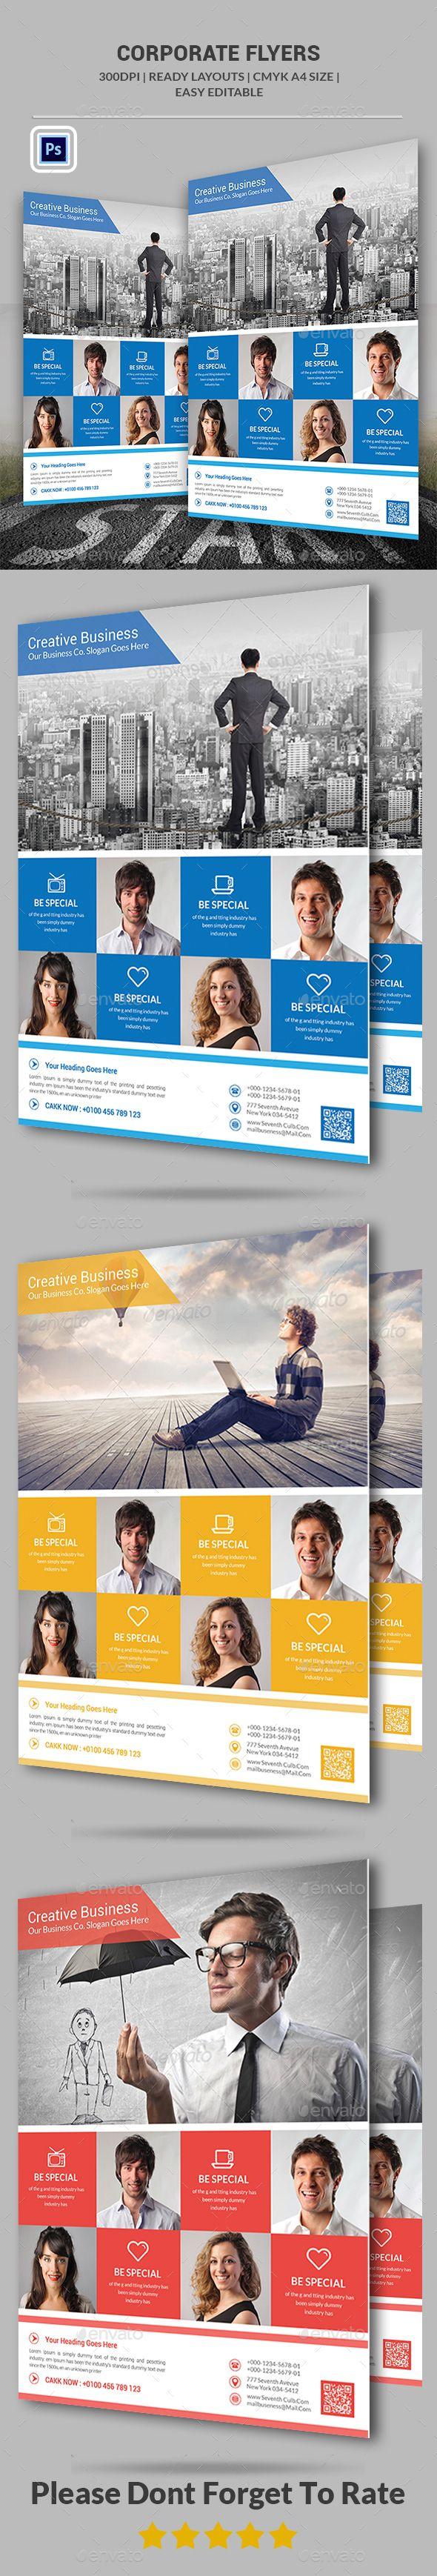 Corporate Flyer Template PSD #design Download: http://graphicriver.net/item/corporate-flyer/13688601?ref=ksioks